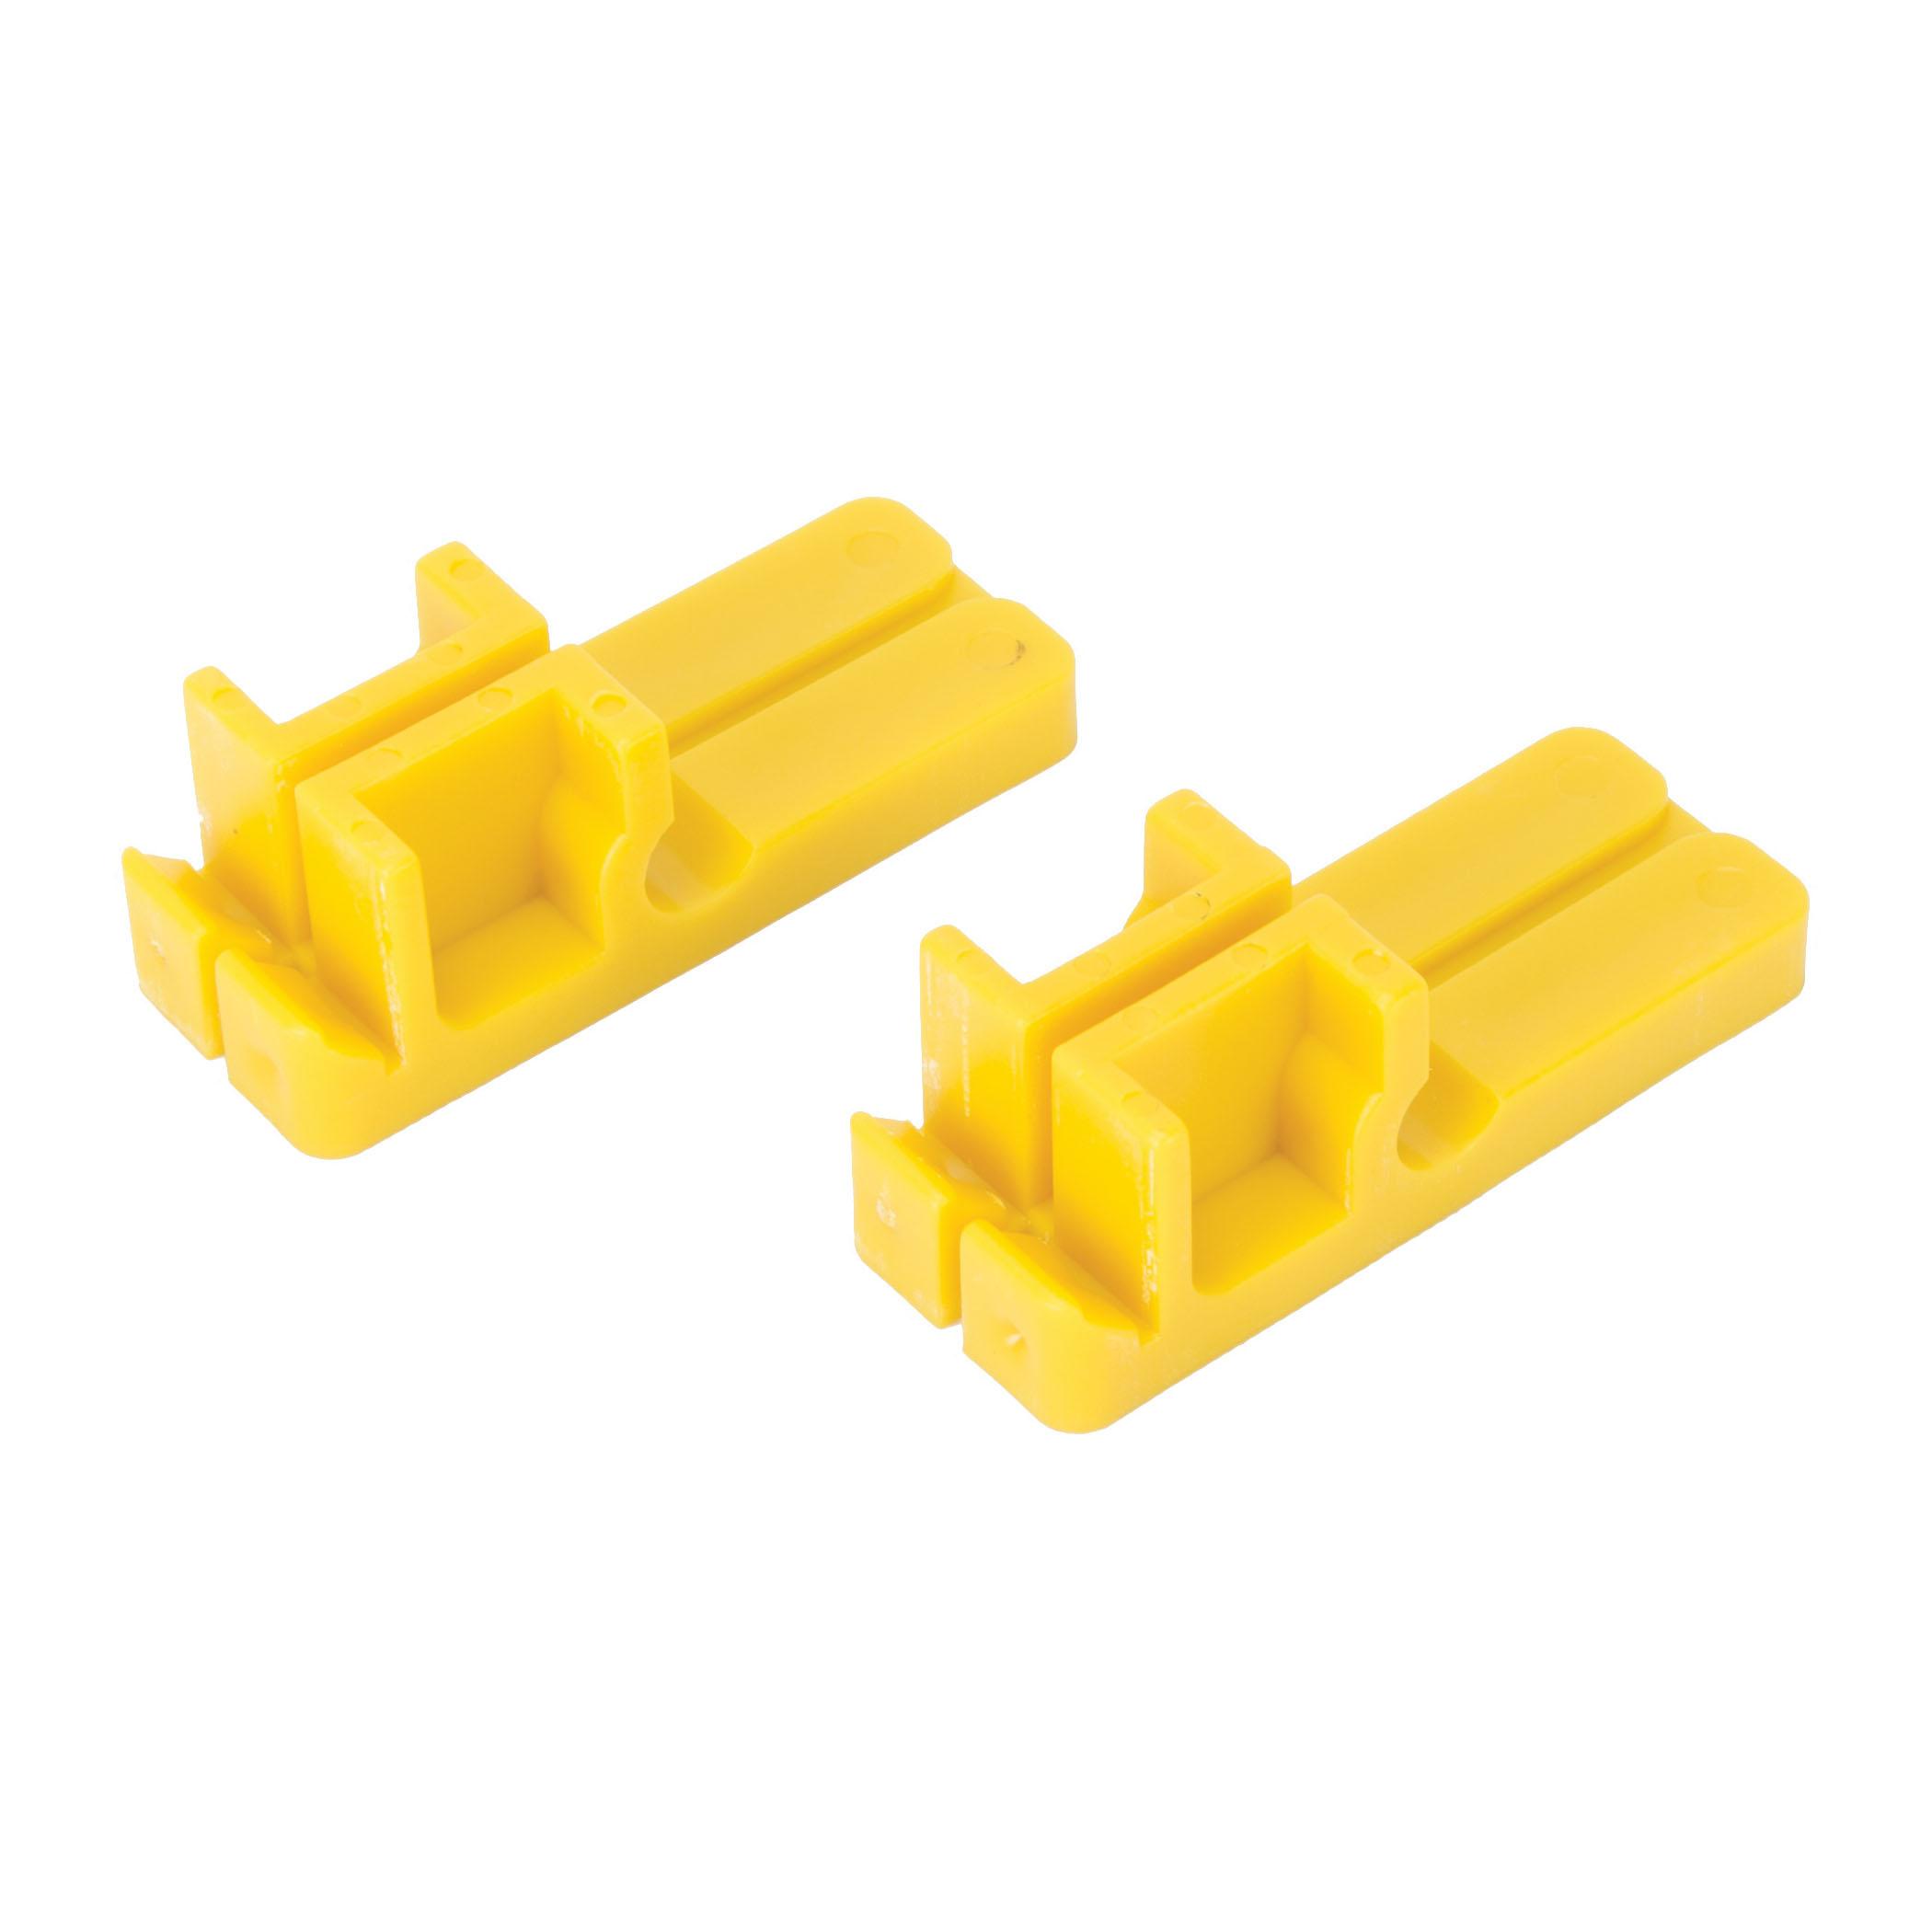 Picture of Vulcan 31056 Masonry Line Block, 4-1/4 in L, Plastic